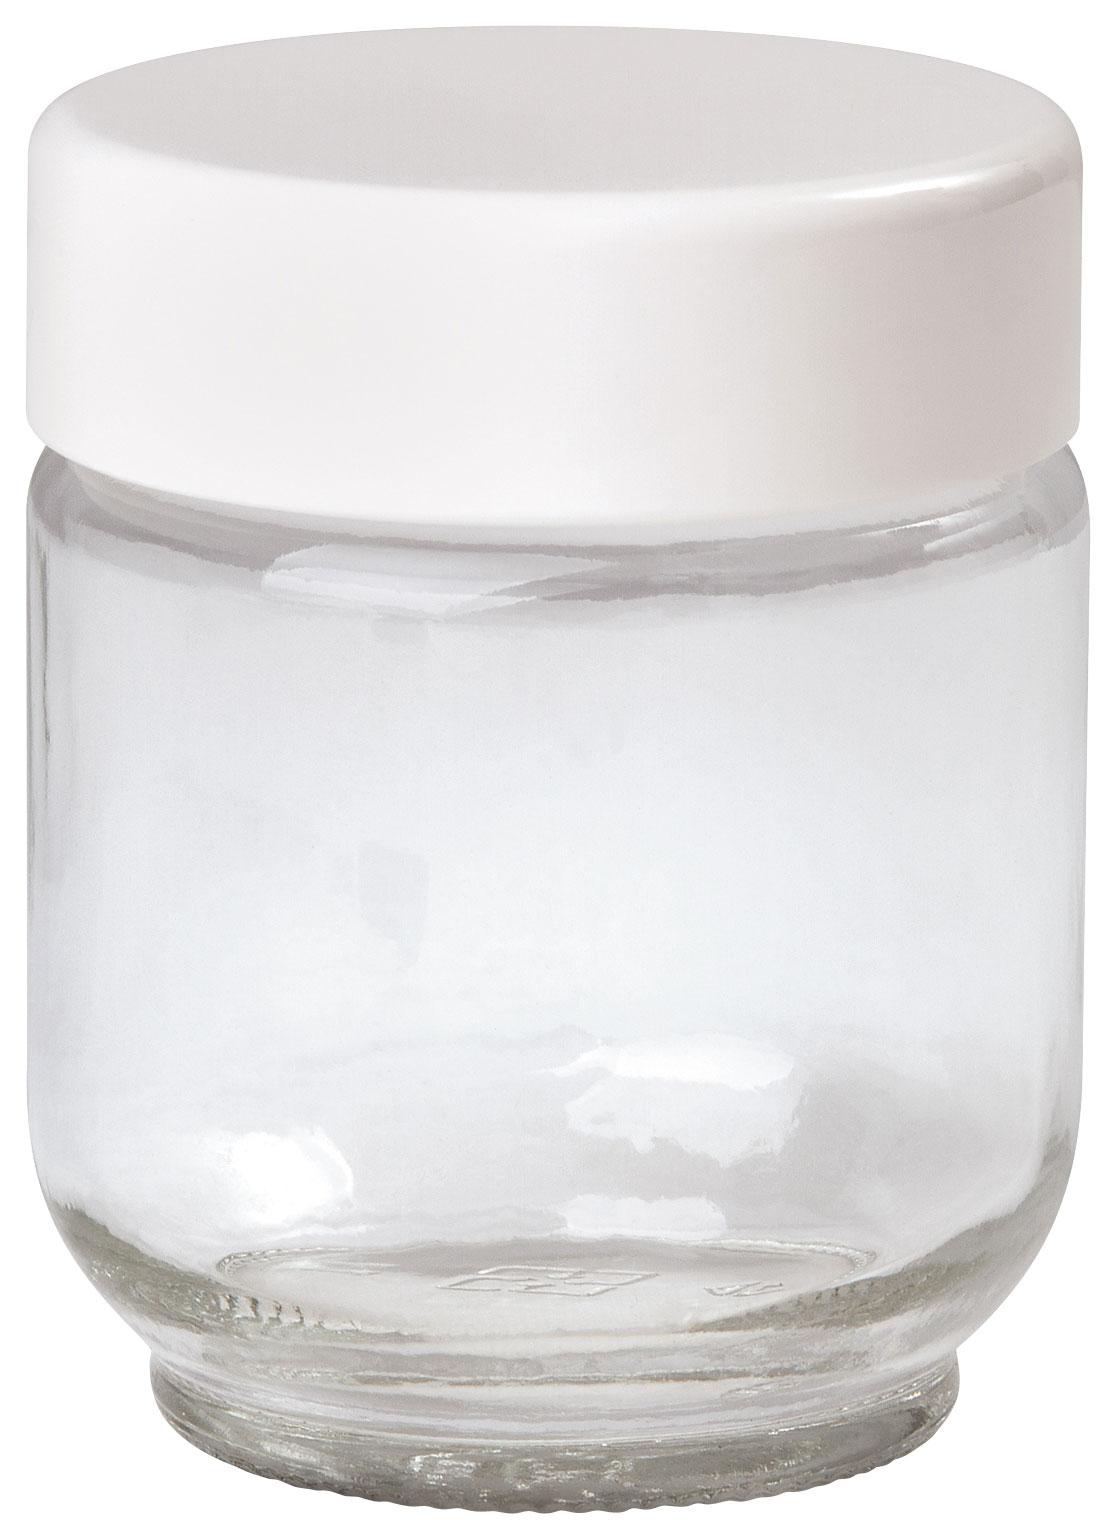 Euro Cuisine - 6-Oz. Glass Jars for Euro Cuisine YM80 and YM100 Yogurt Makers (8-Pack) - White